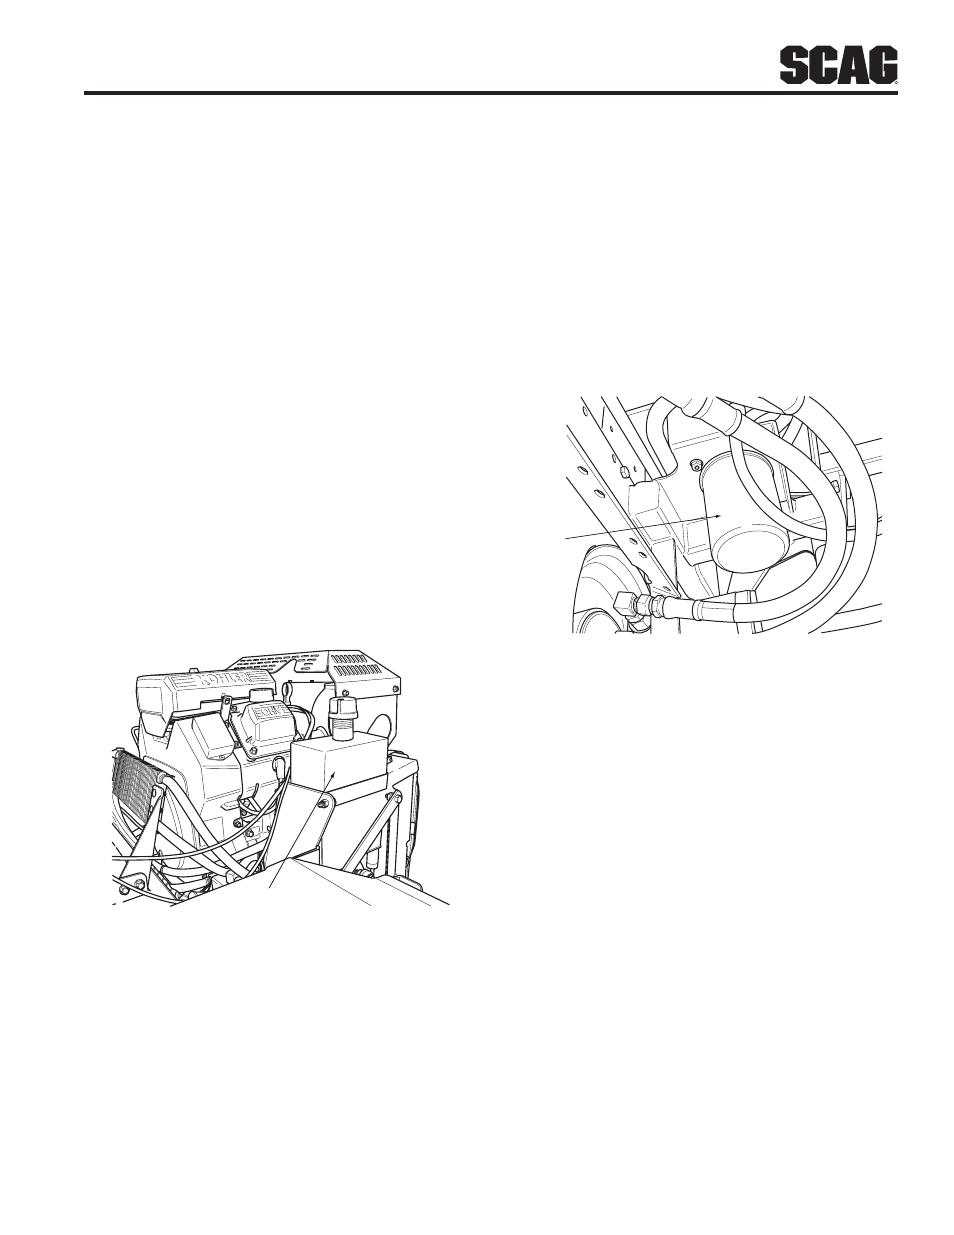 3 Hydraulic System Scag Equipment Turf Tiger Stt52v 27ch User Manual Page 40 138